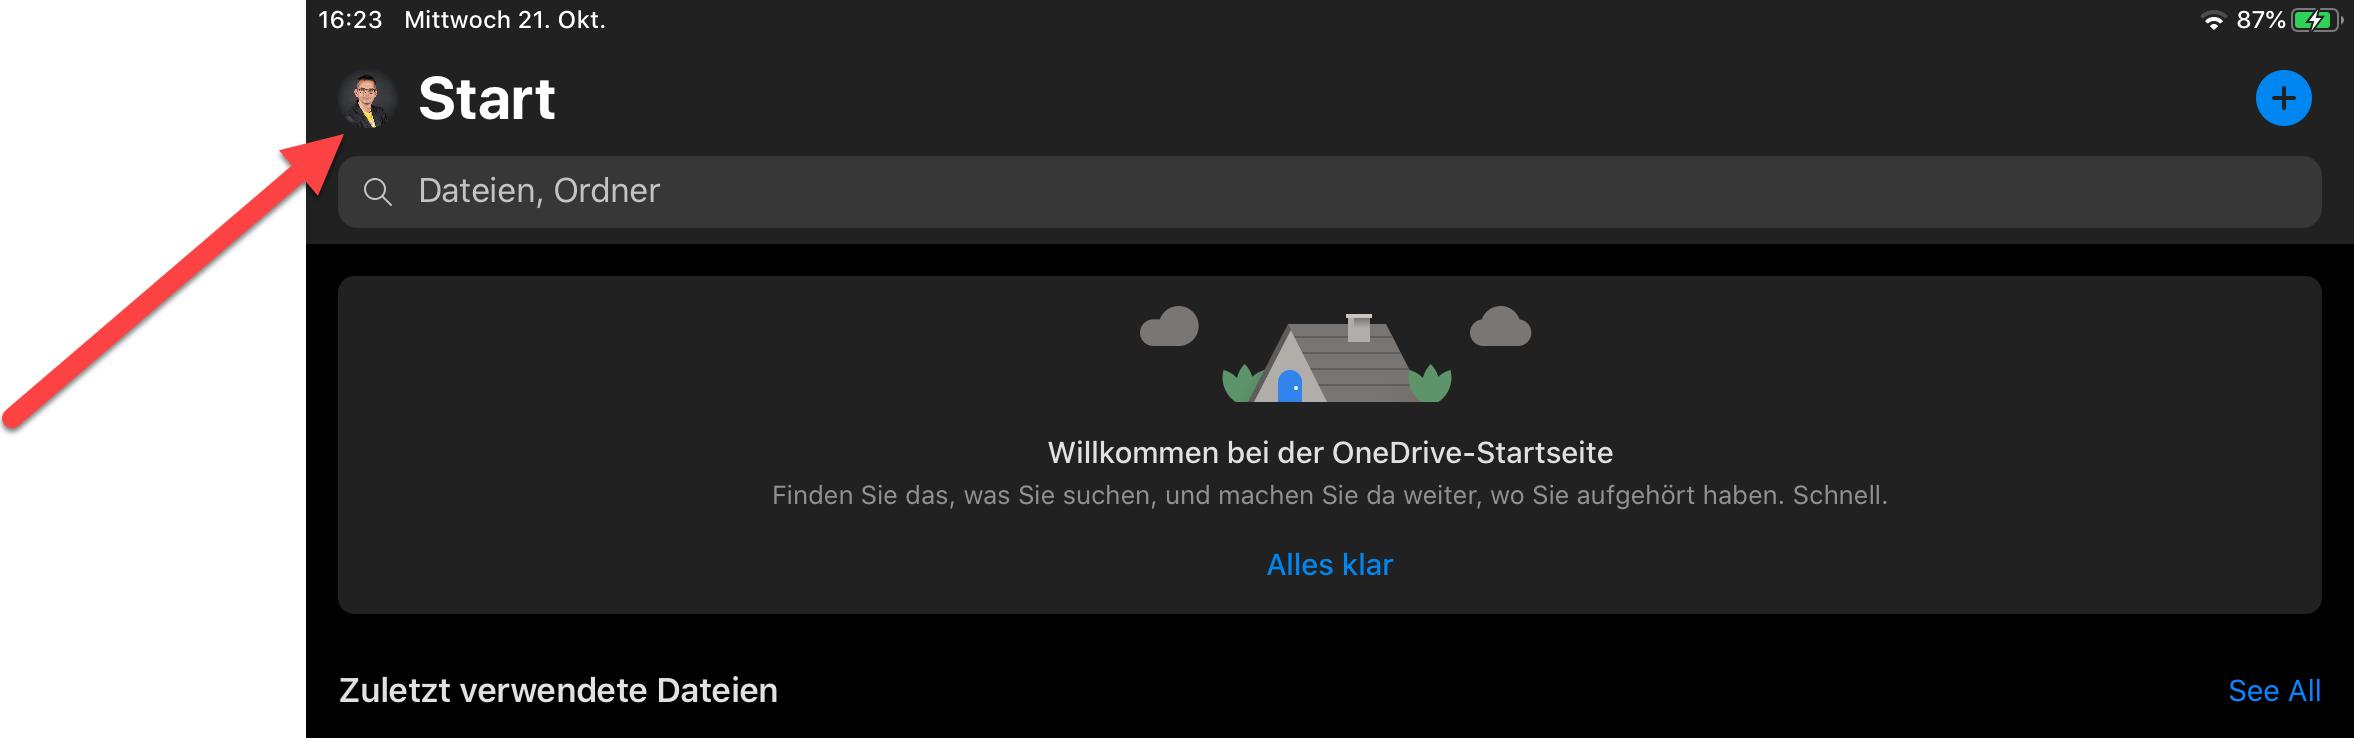 OneDrive auf iPad abmelden 0